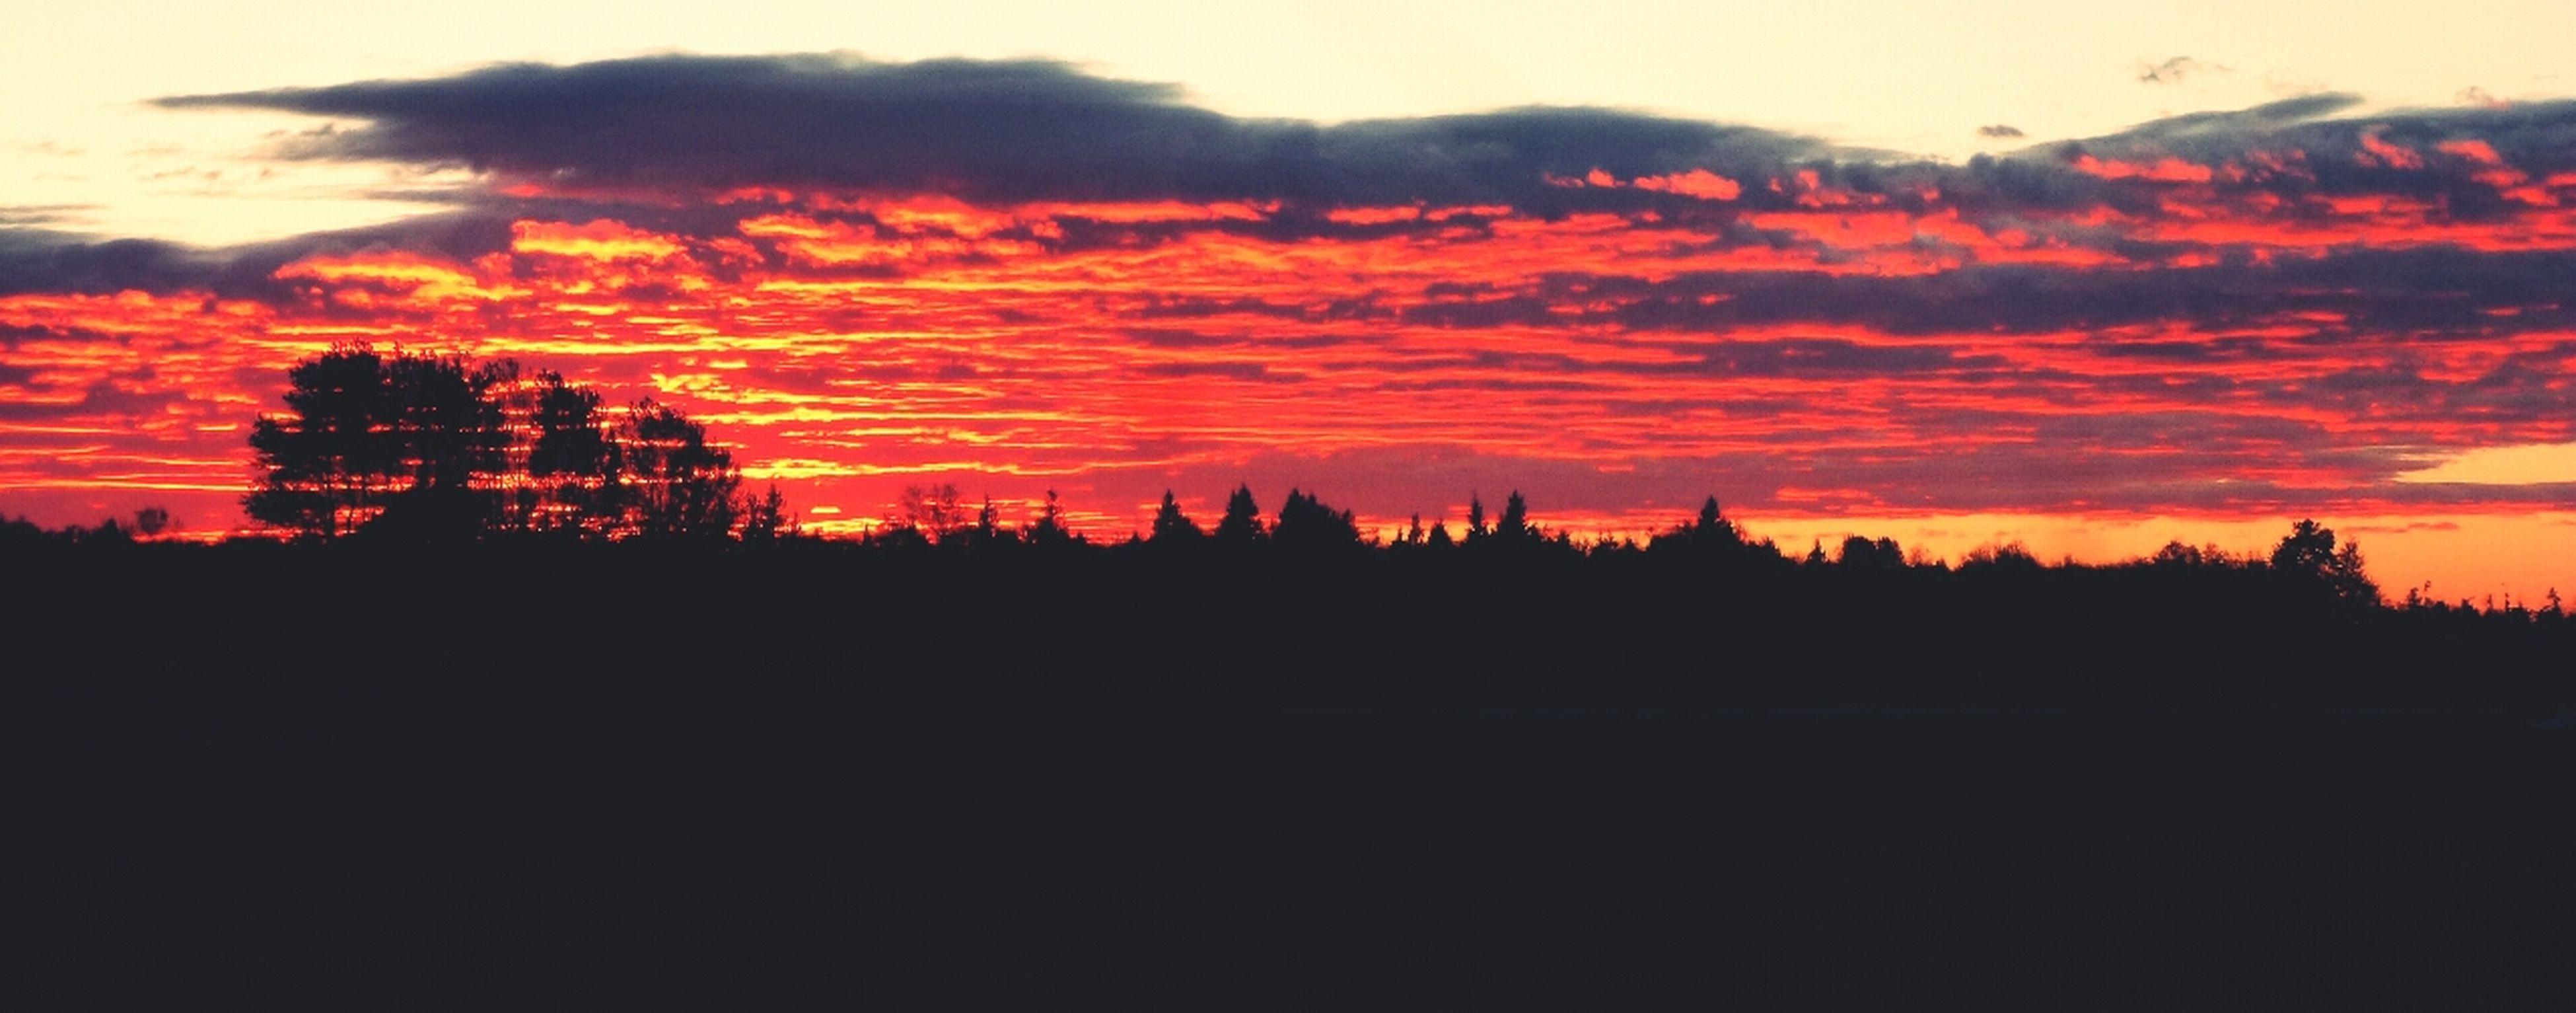 sunset, silhouette, tranquil scene, scenics, tranquility, beauty in nature, orange color, sky, tree, nature, idyllic, landscape, cloud - sky, dark, outdoors, no people, non-urban scene, majestic, dramatic sky, non urban scene